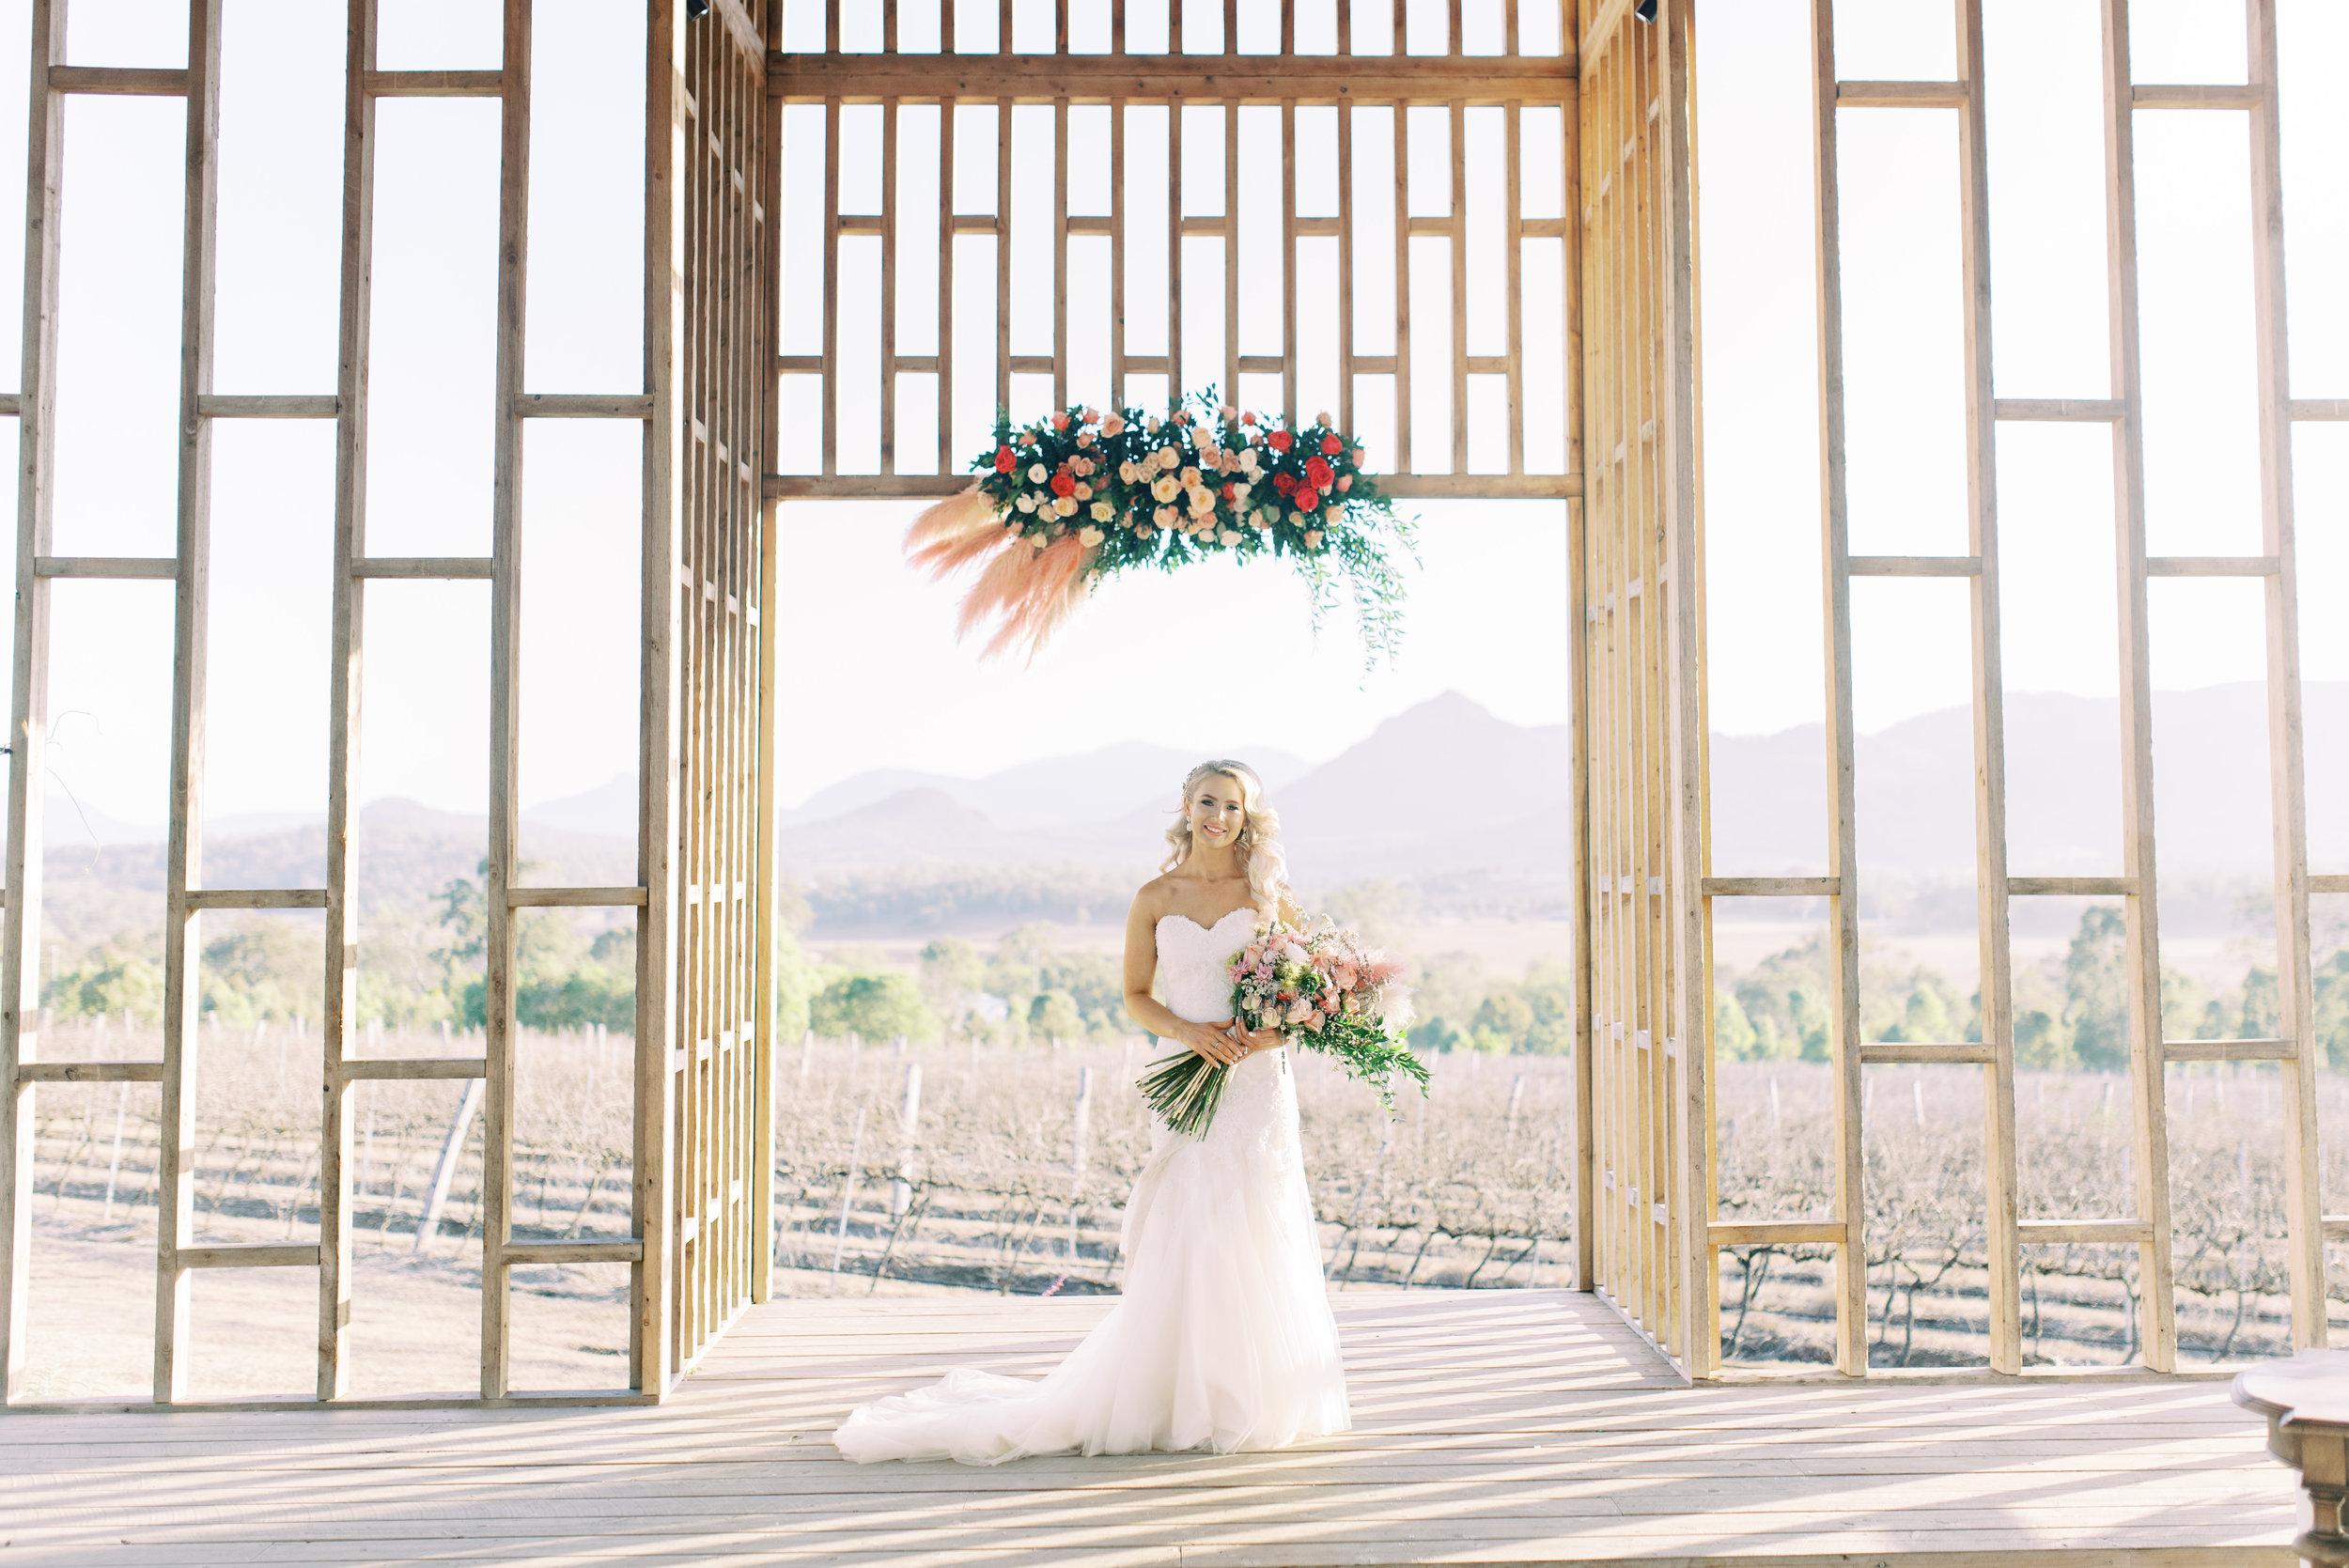 Kooroomba-Vineyard-Lavender-Farm-Wedding-Fine-Art-Lauren-Olivia-65.jpg